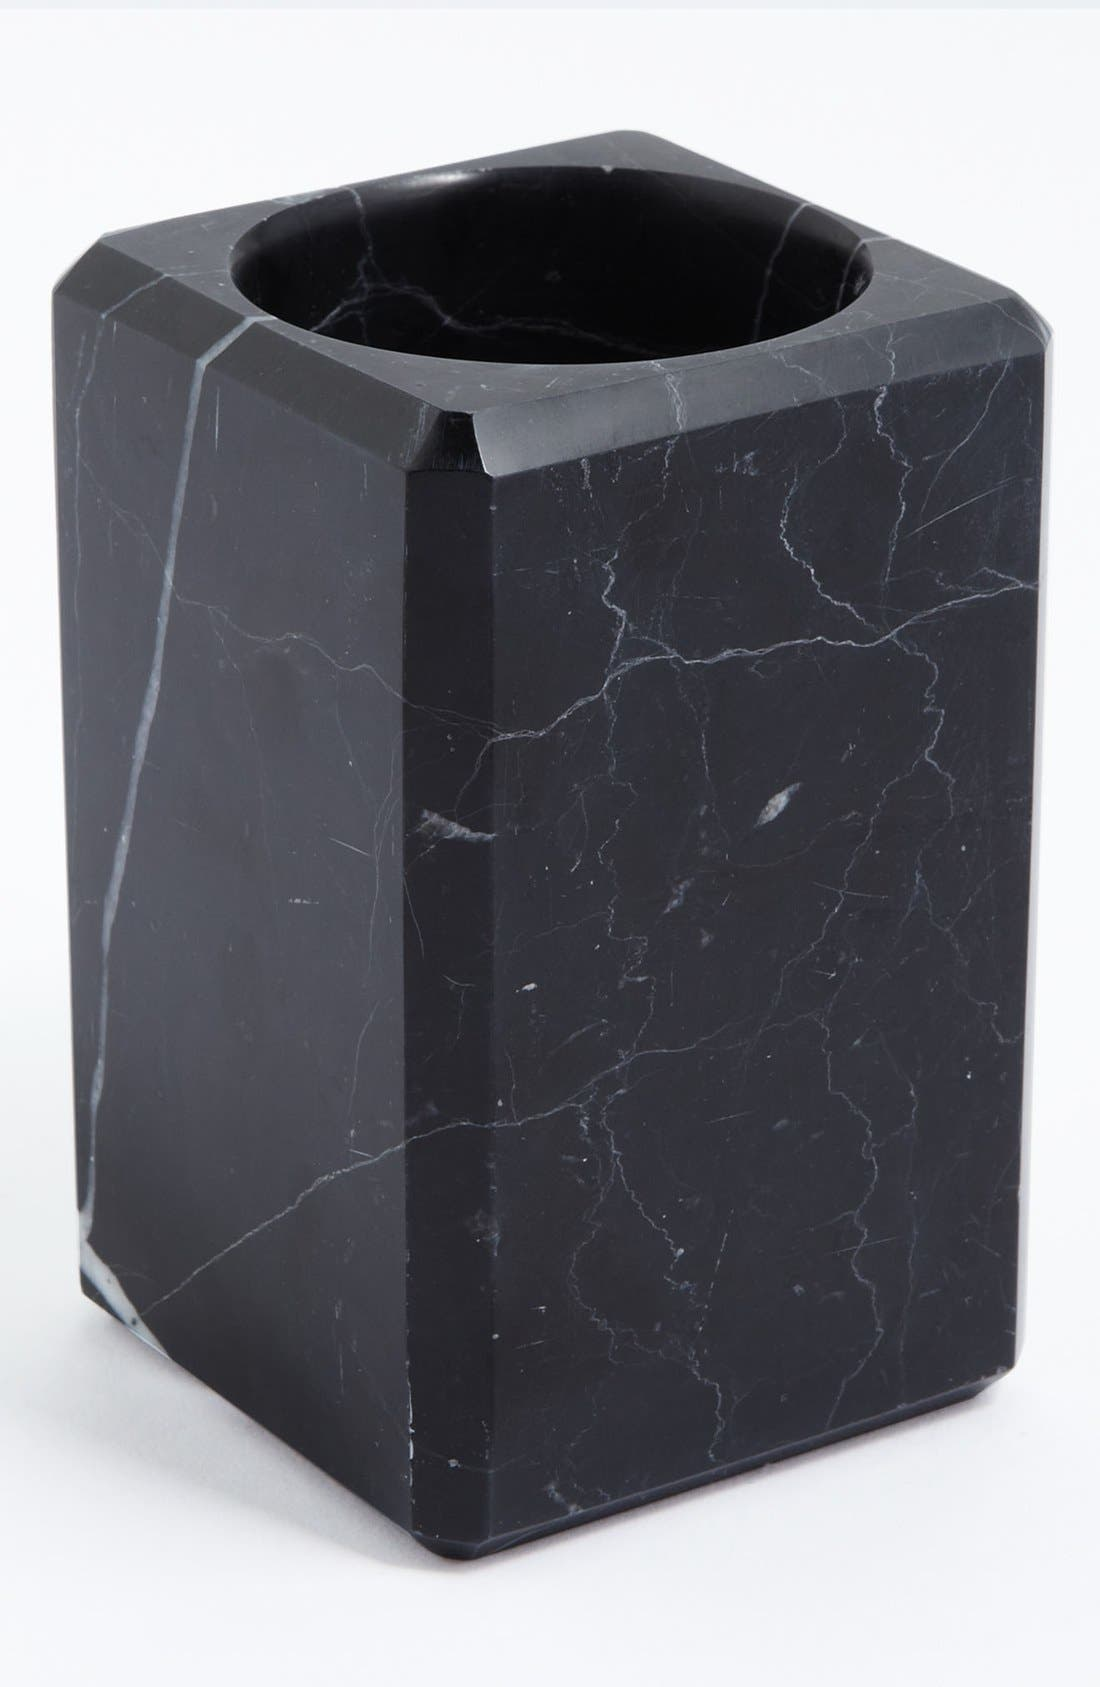 Waterworks Studio 'Luna' Black Marble Tumbler (Online Only)